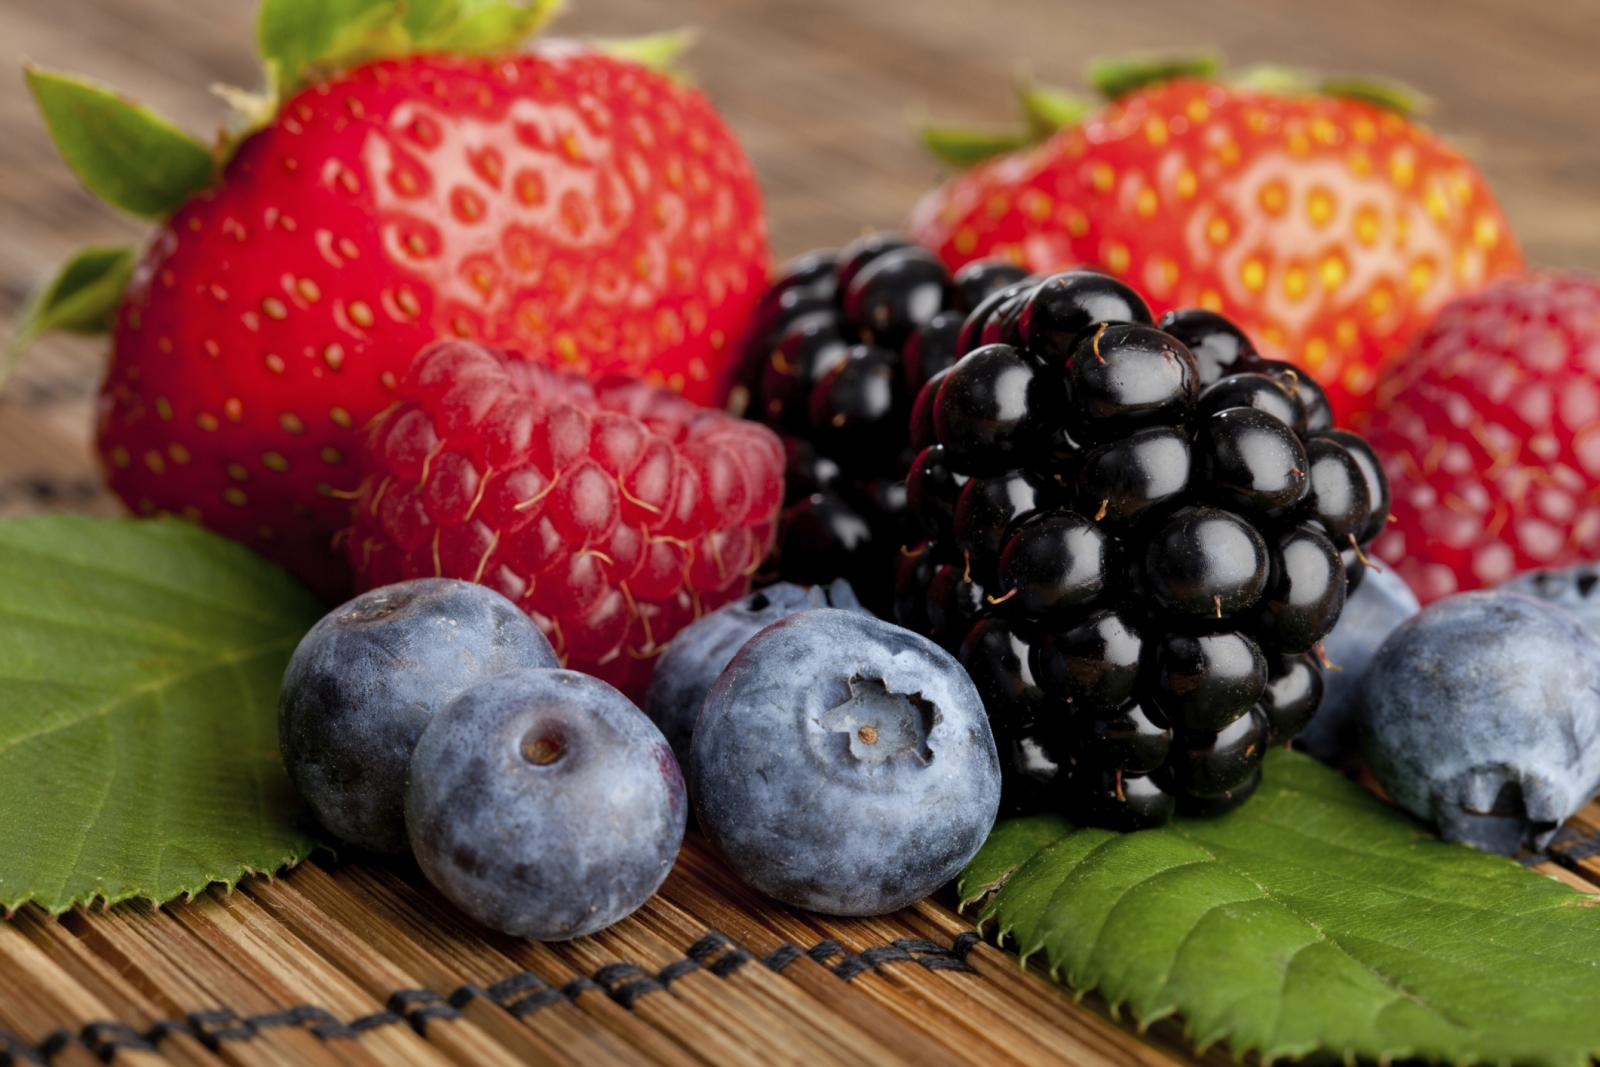 fruits-berries